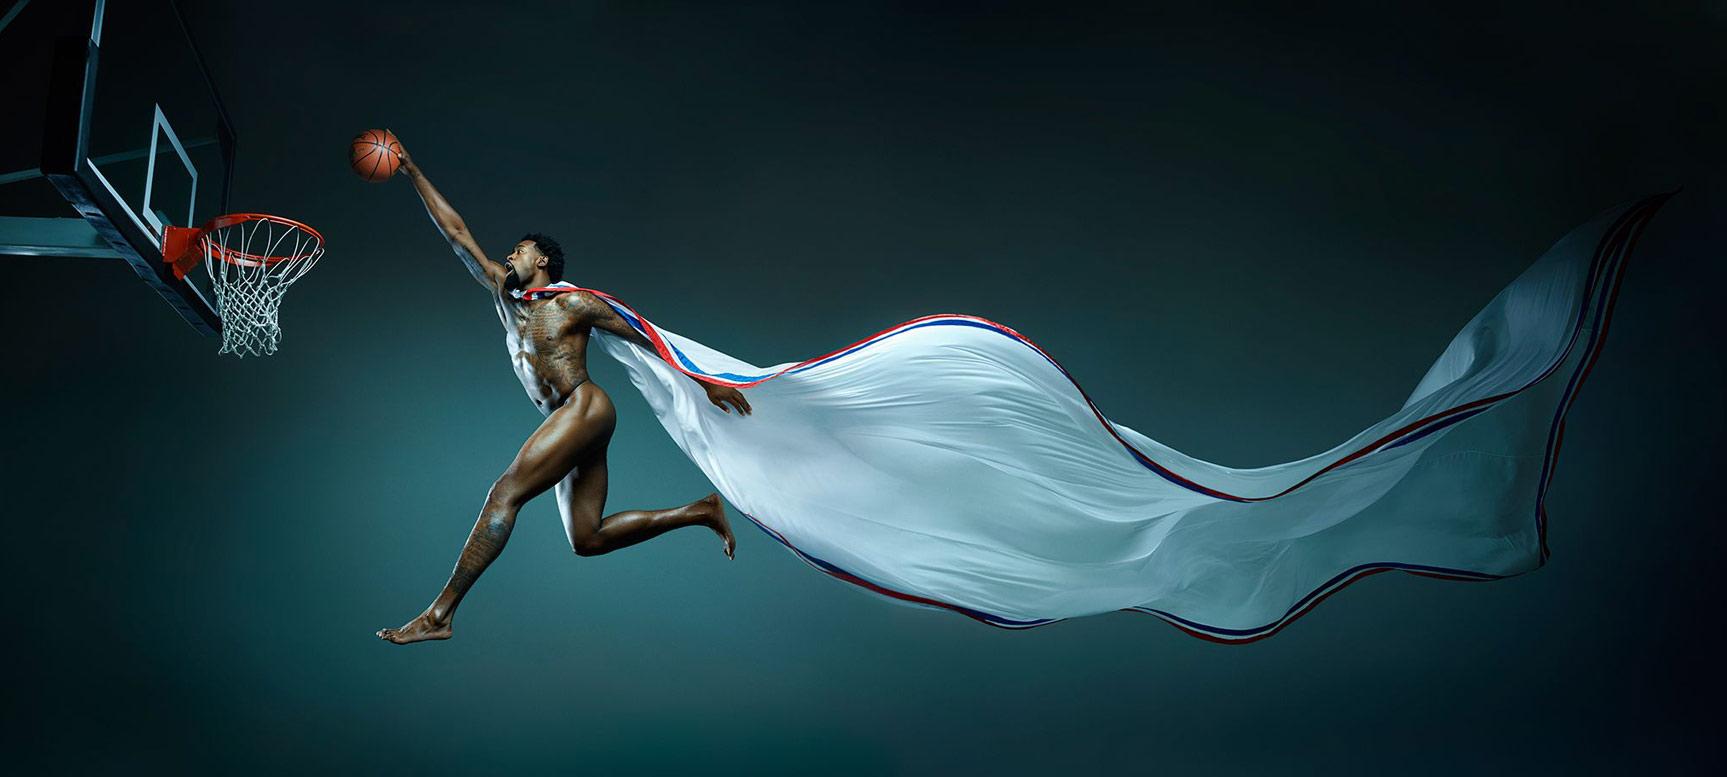 ESPN Magazine The Body Issue 2015 - DeAndre Jordan / ДеАндре Джордан - Культ тела журнала ESPN